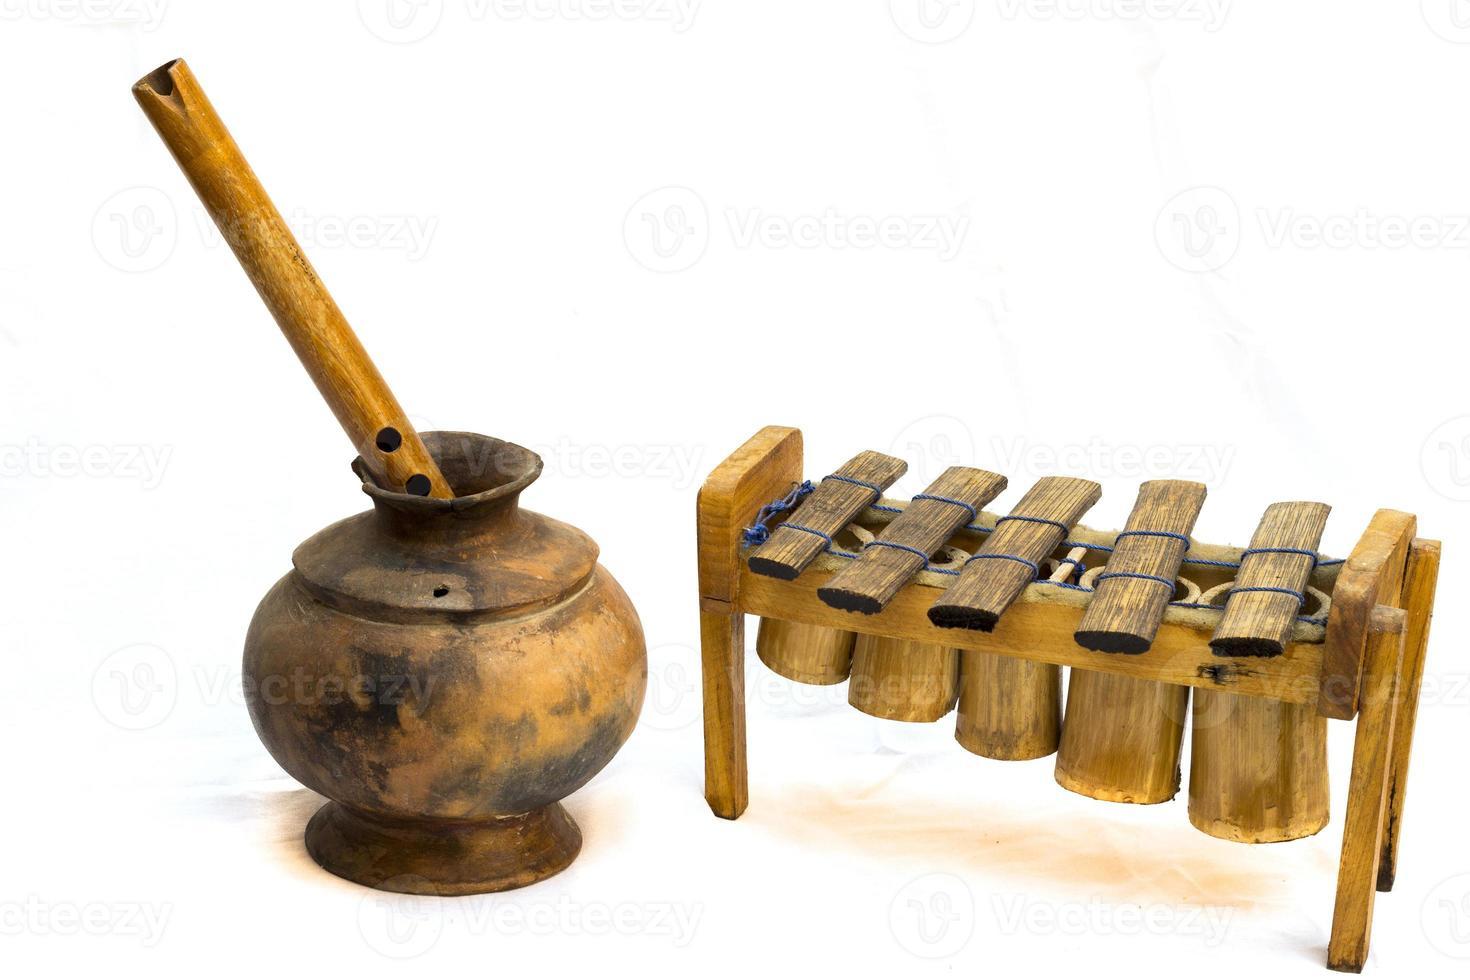 andinska instrument foto